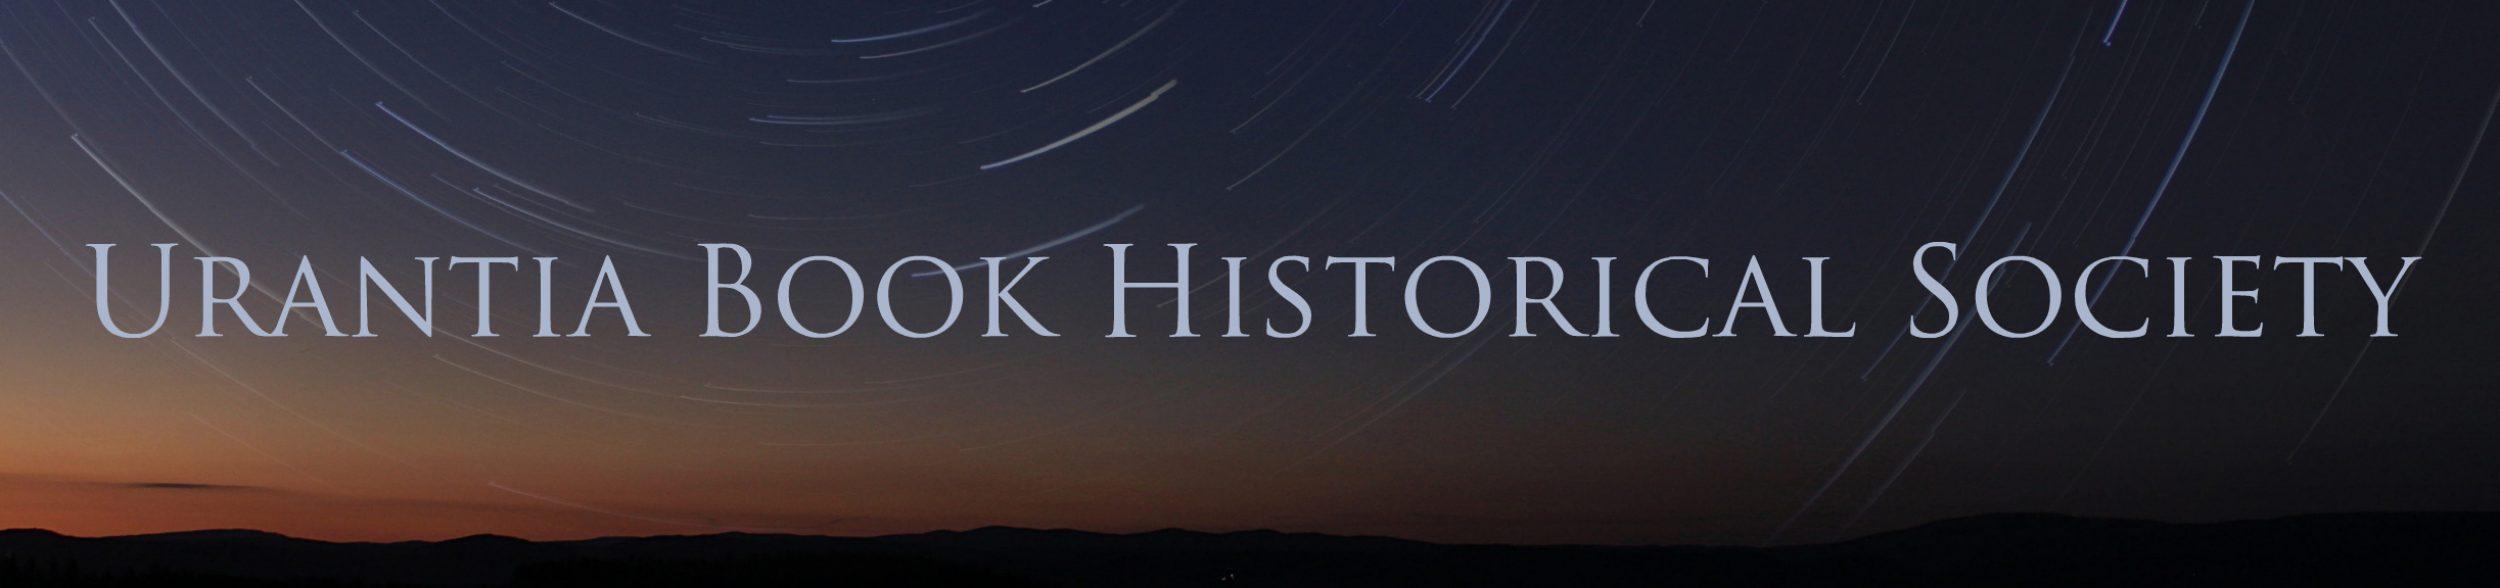 Urantia Book Historical Society